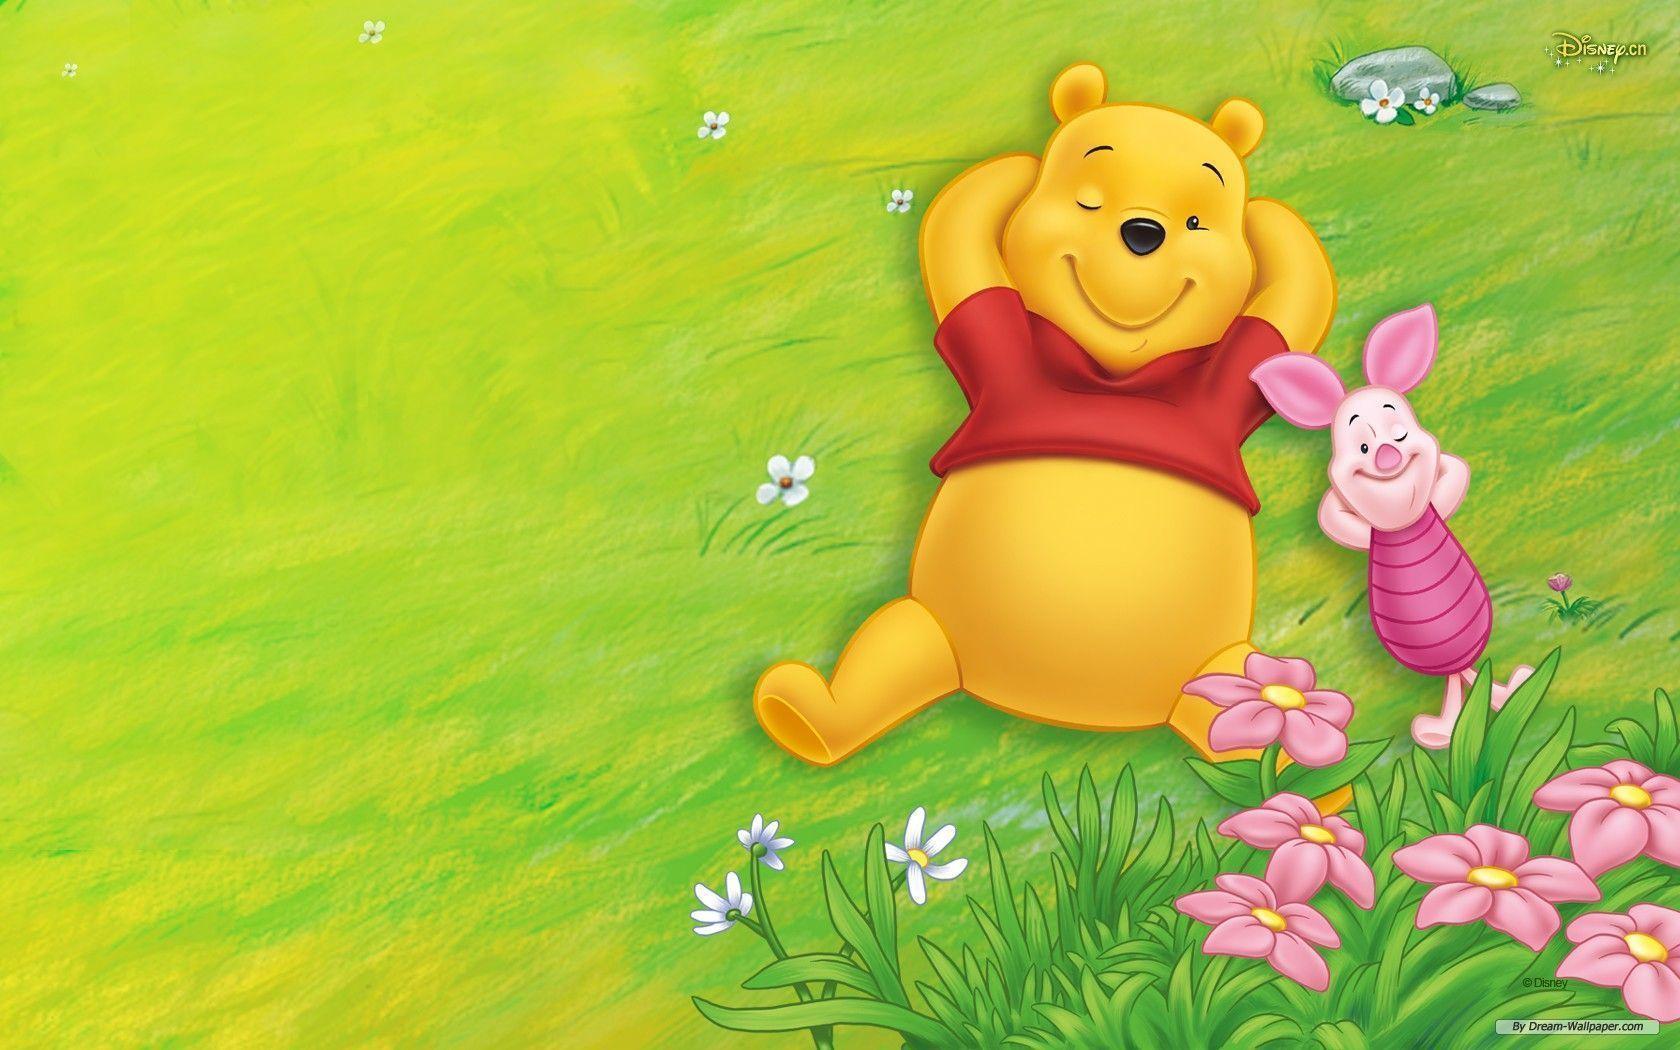 Winnie the pooh desktop wallpapers wallpaper cave winnie pooh wallpaper desktop free download voltagebd Images